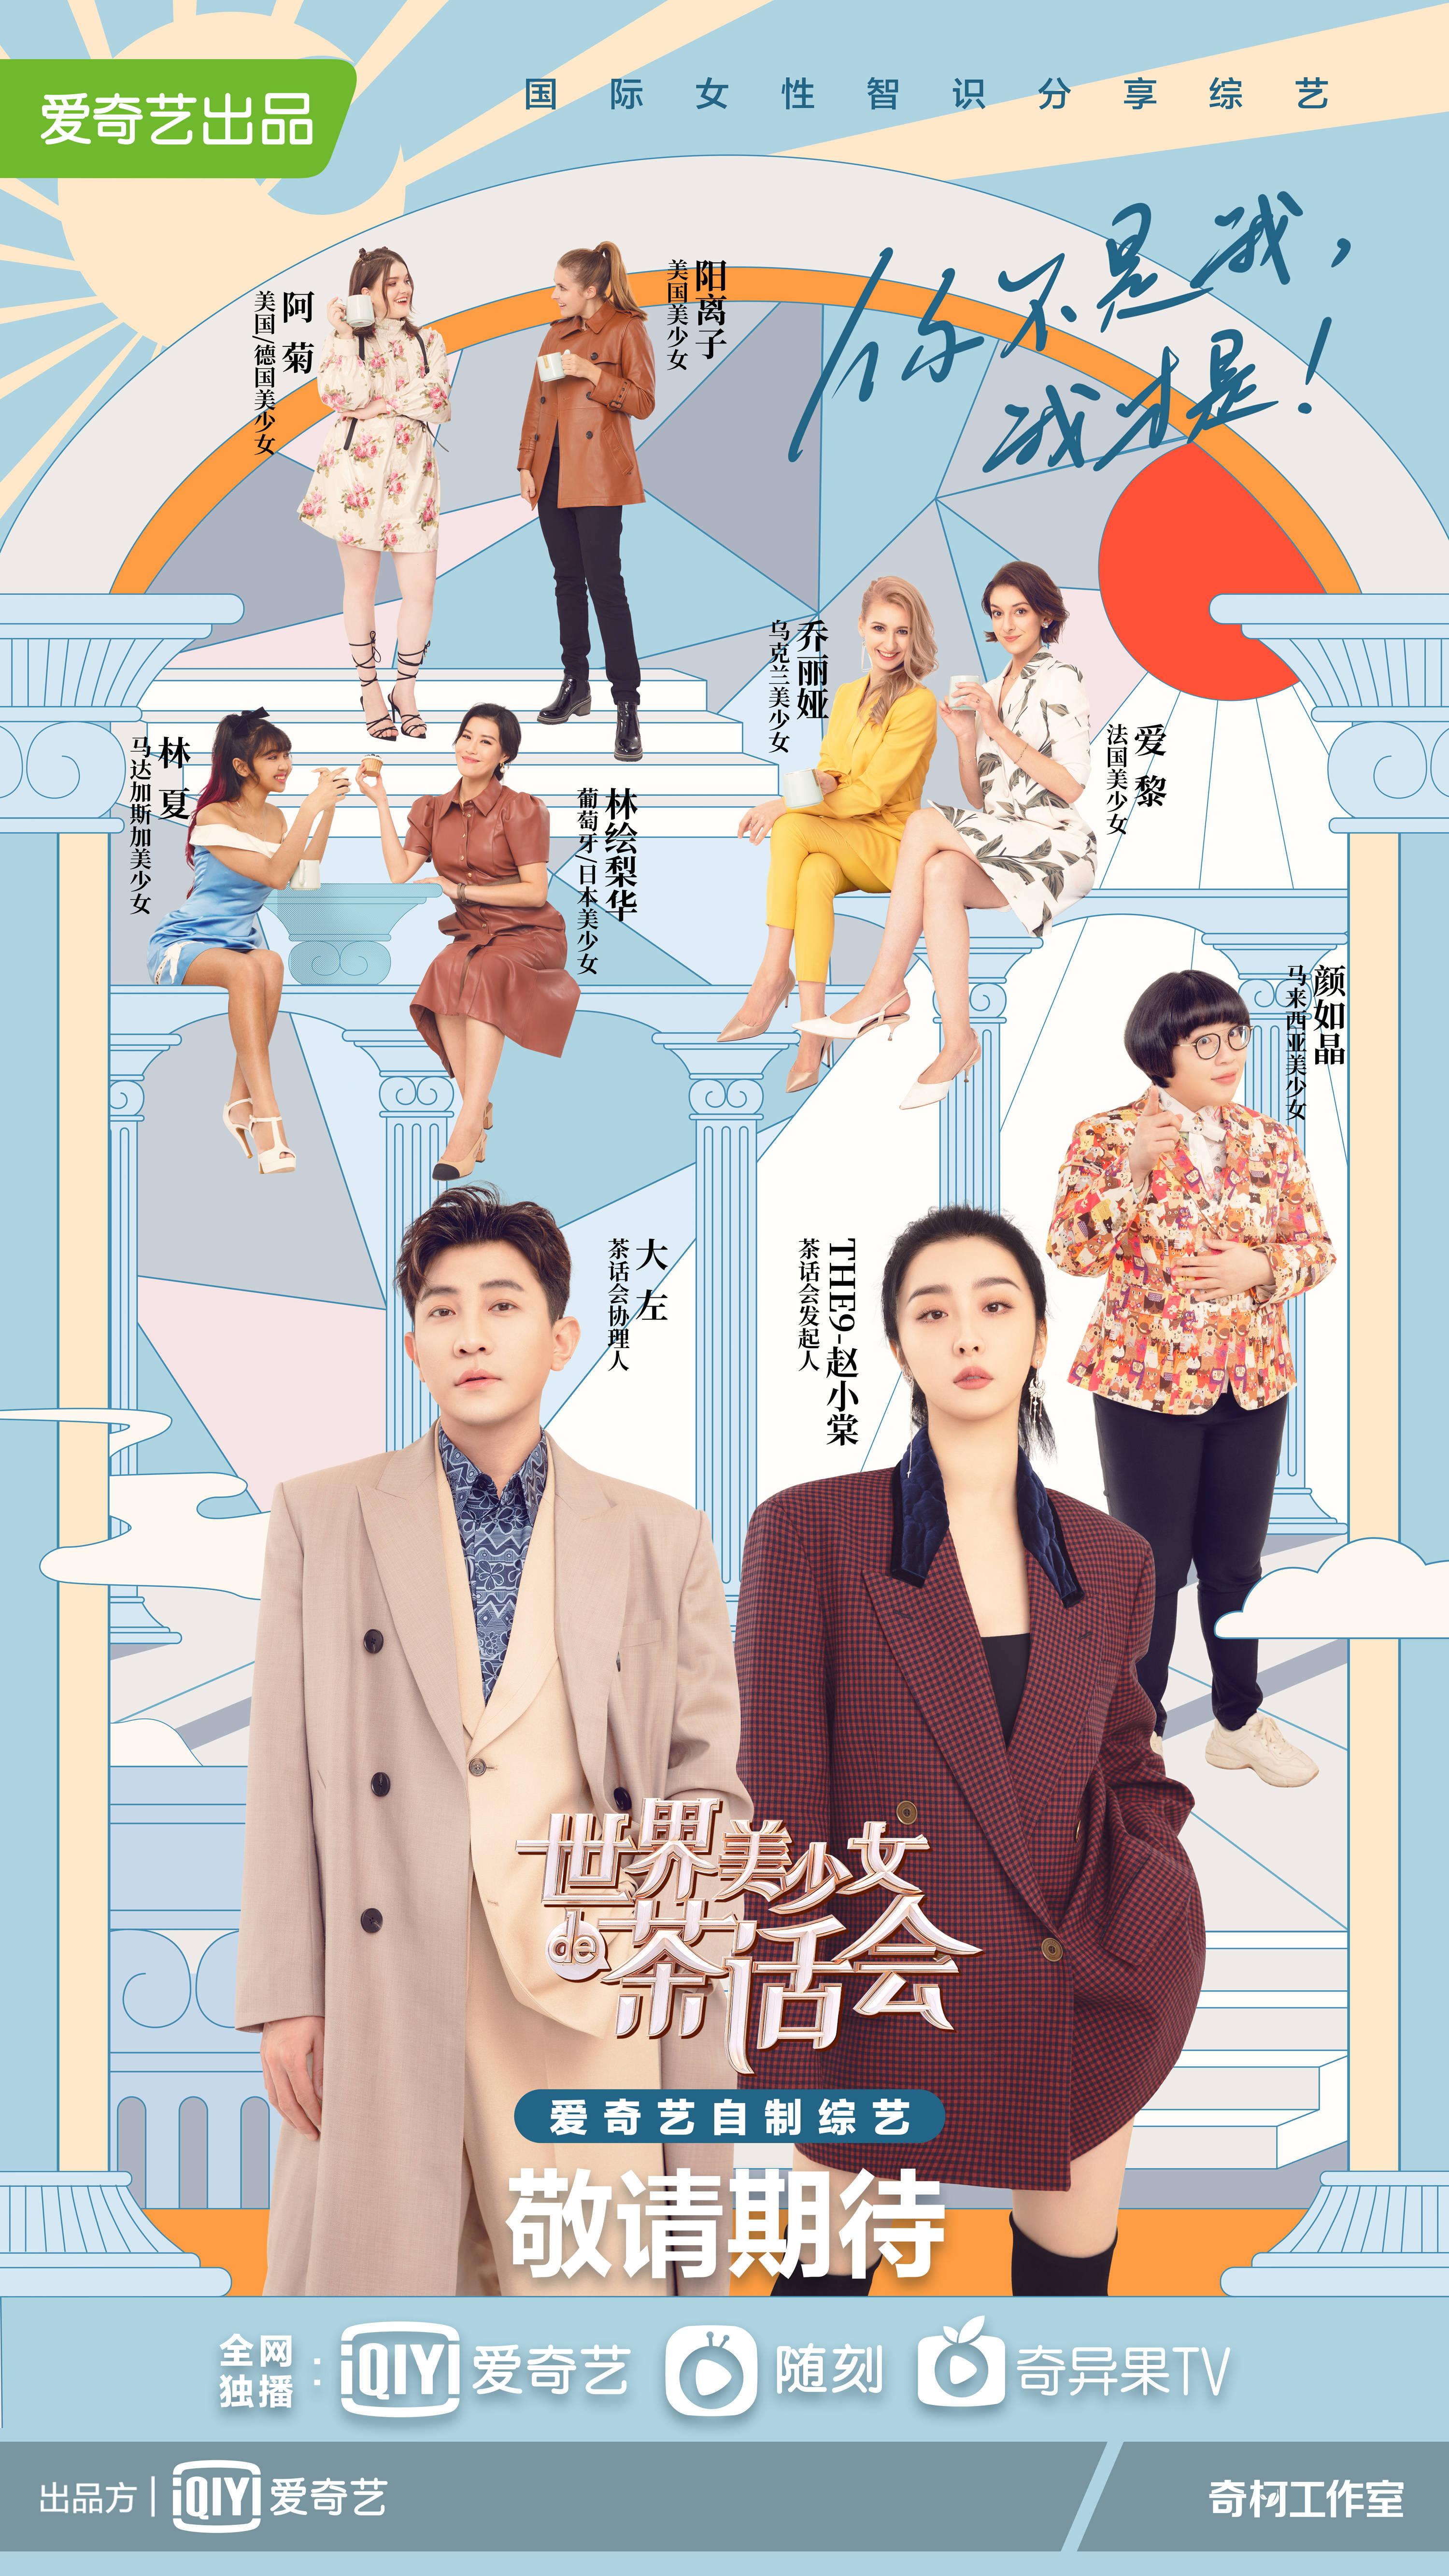 THE9-赵小棠、乃万重聚《世界美少女的茶话会》